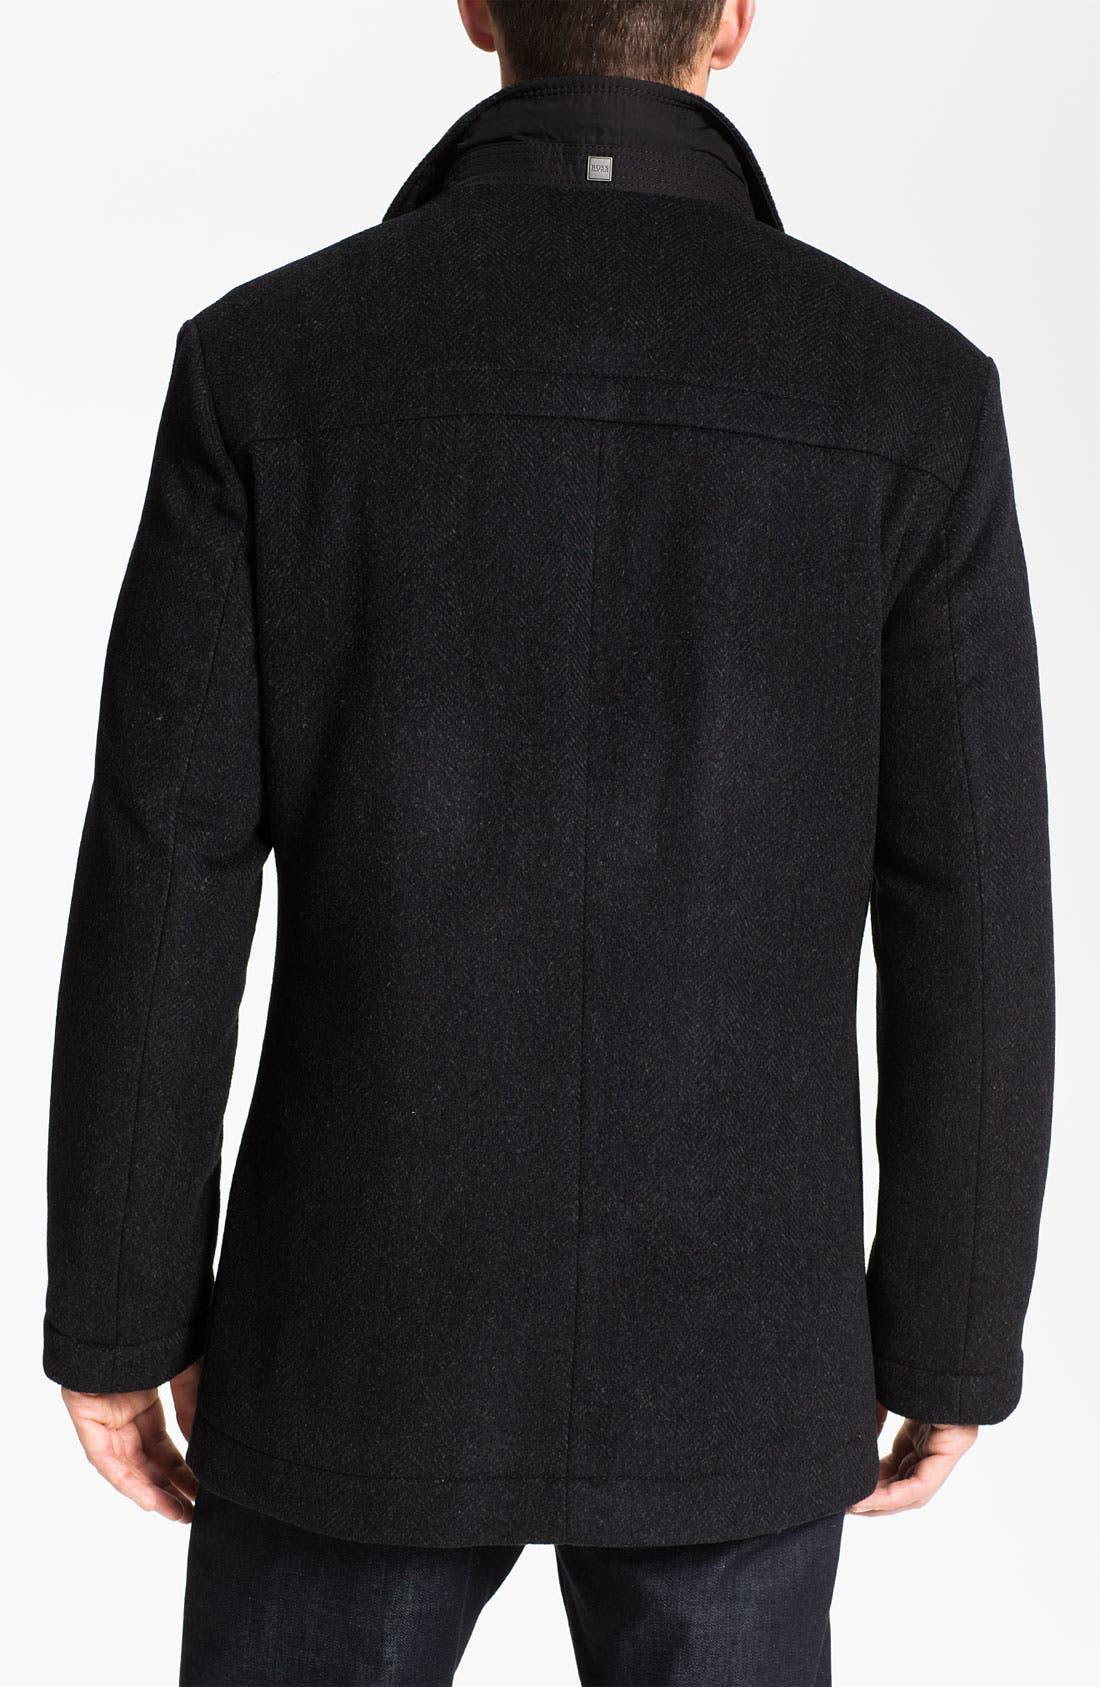 HUGO BOSS 'Coxtan' Wool & Cashmere Coat,                             Alternate thumbnail 2, color,                             001